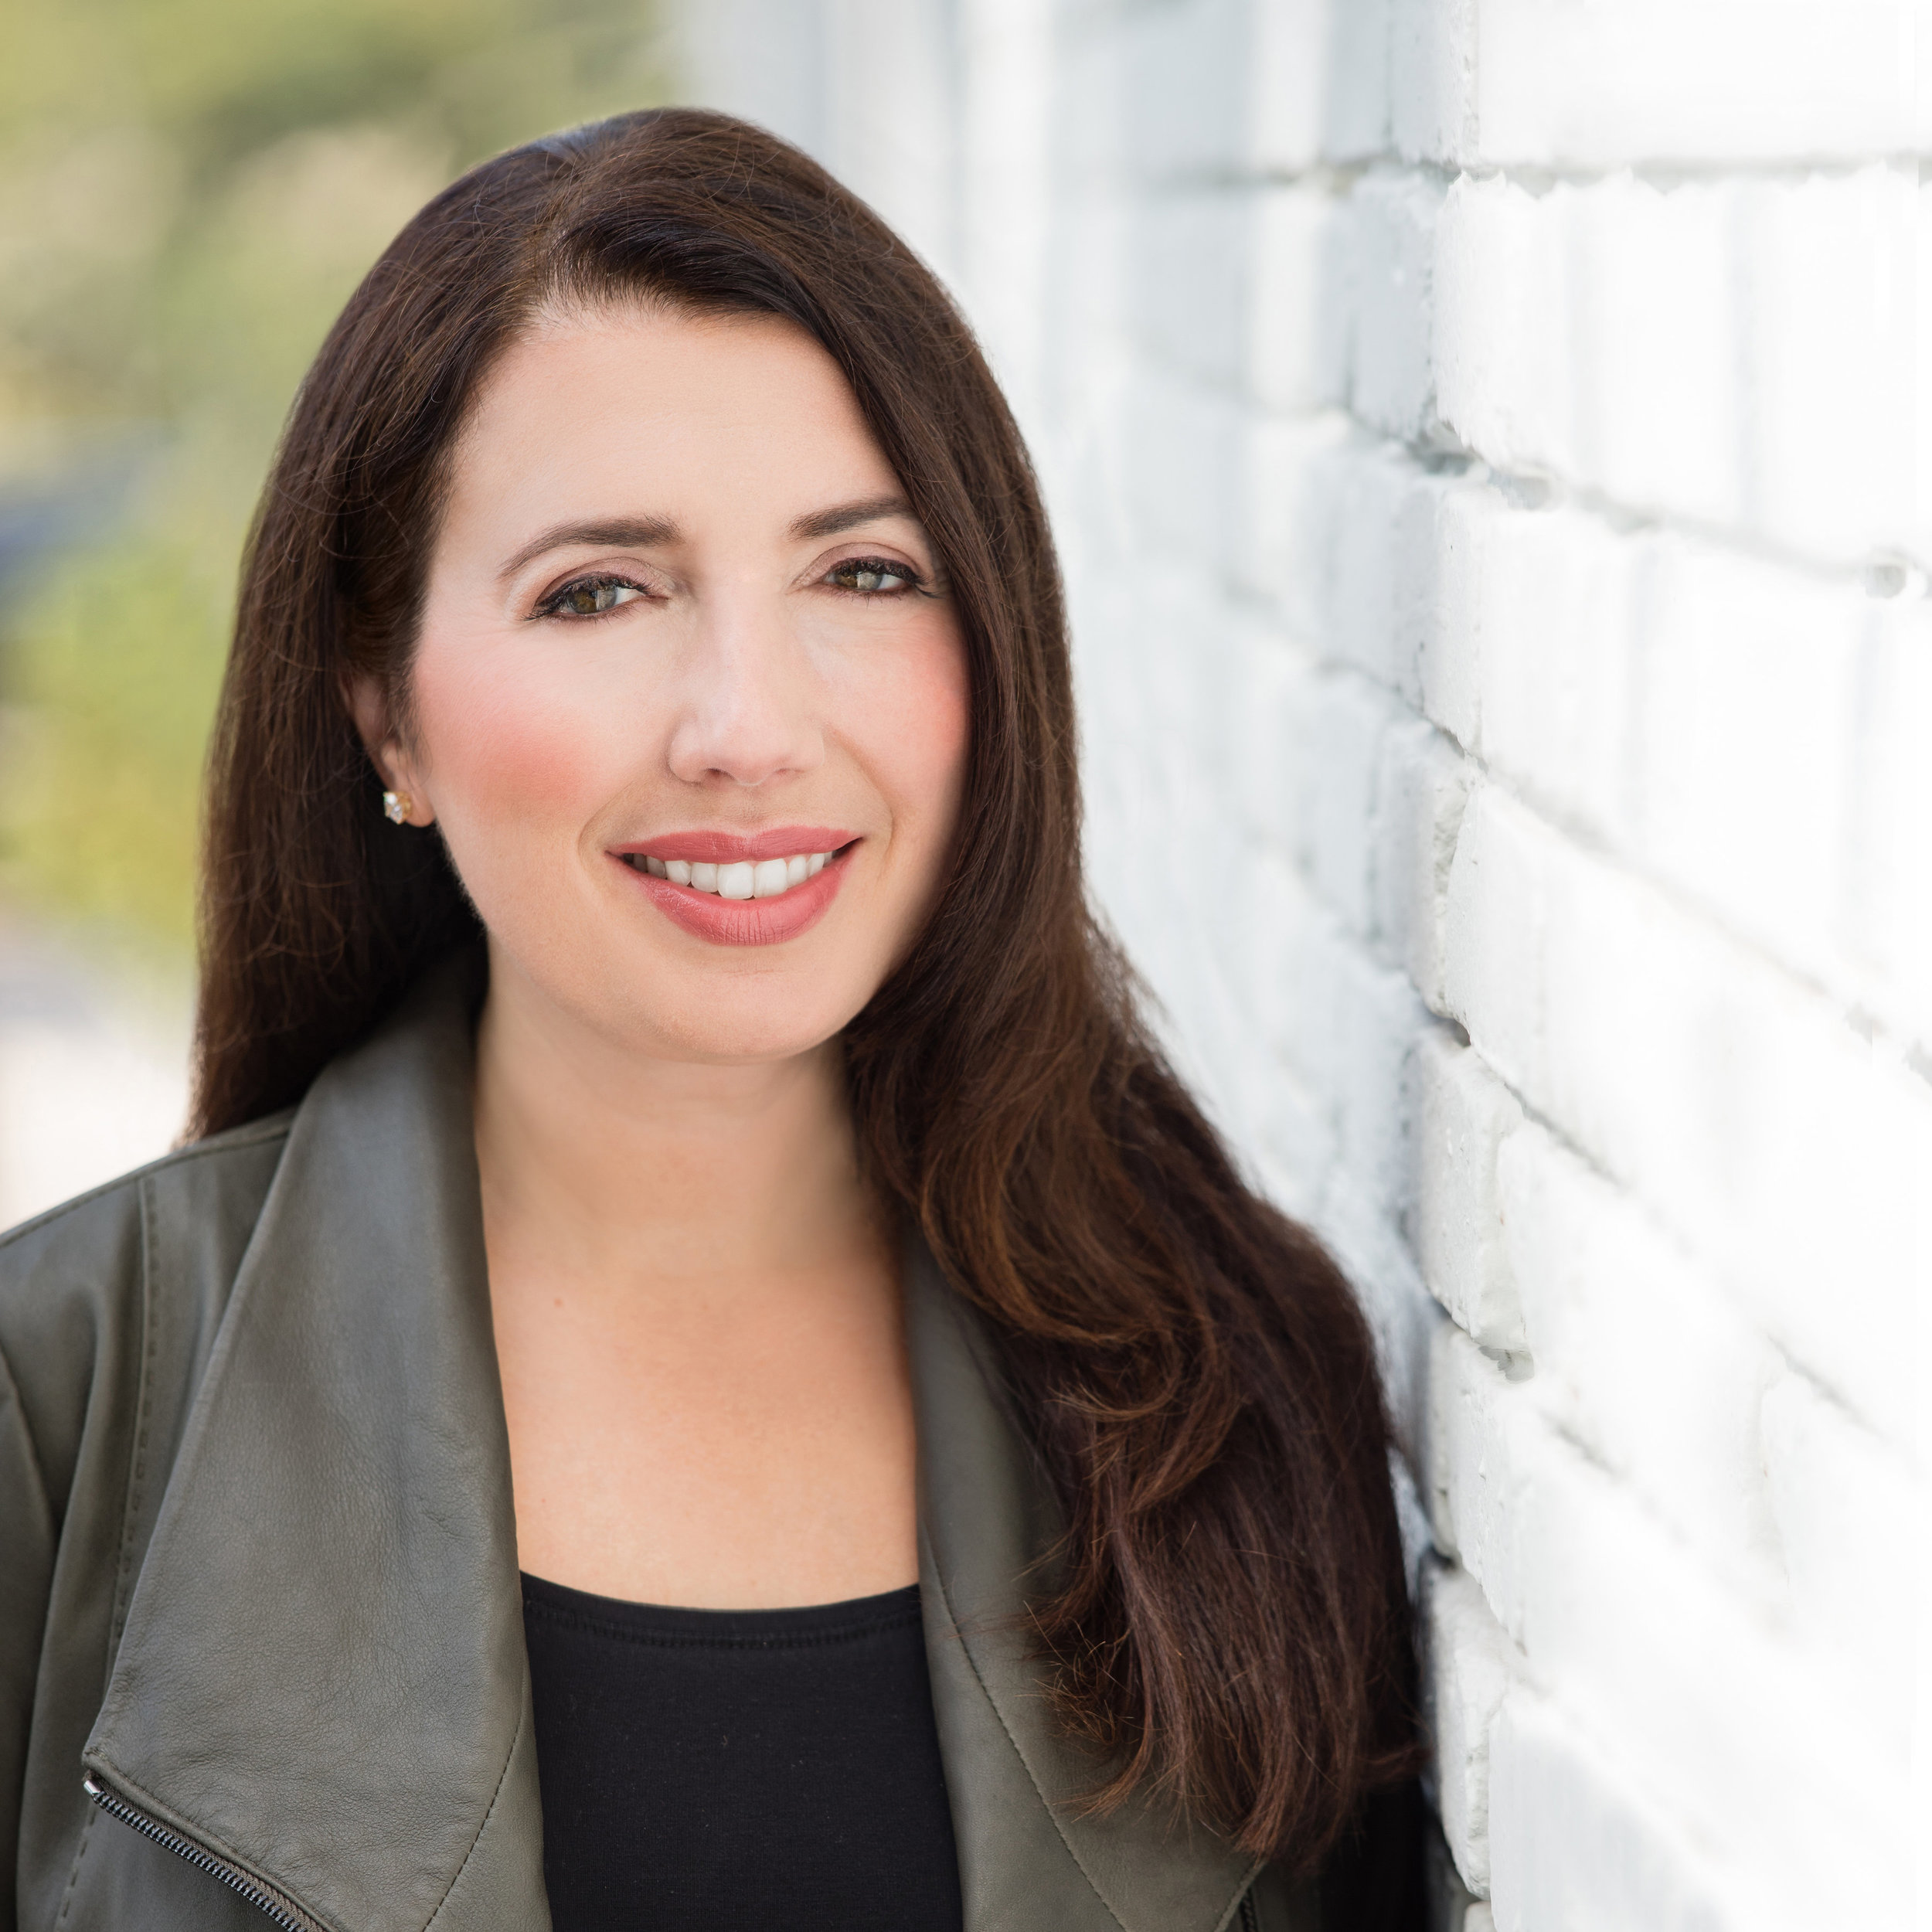 Fran Hauser - Startup Investor & Author